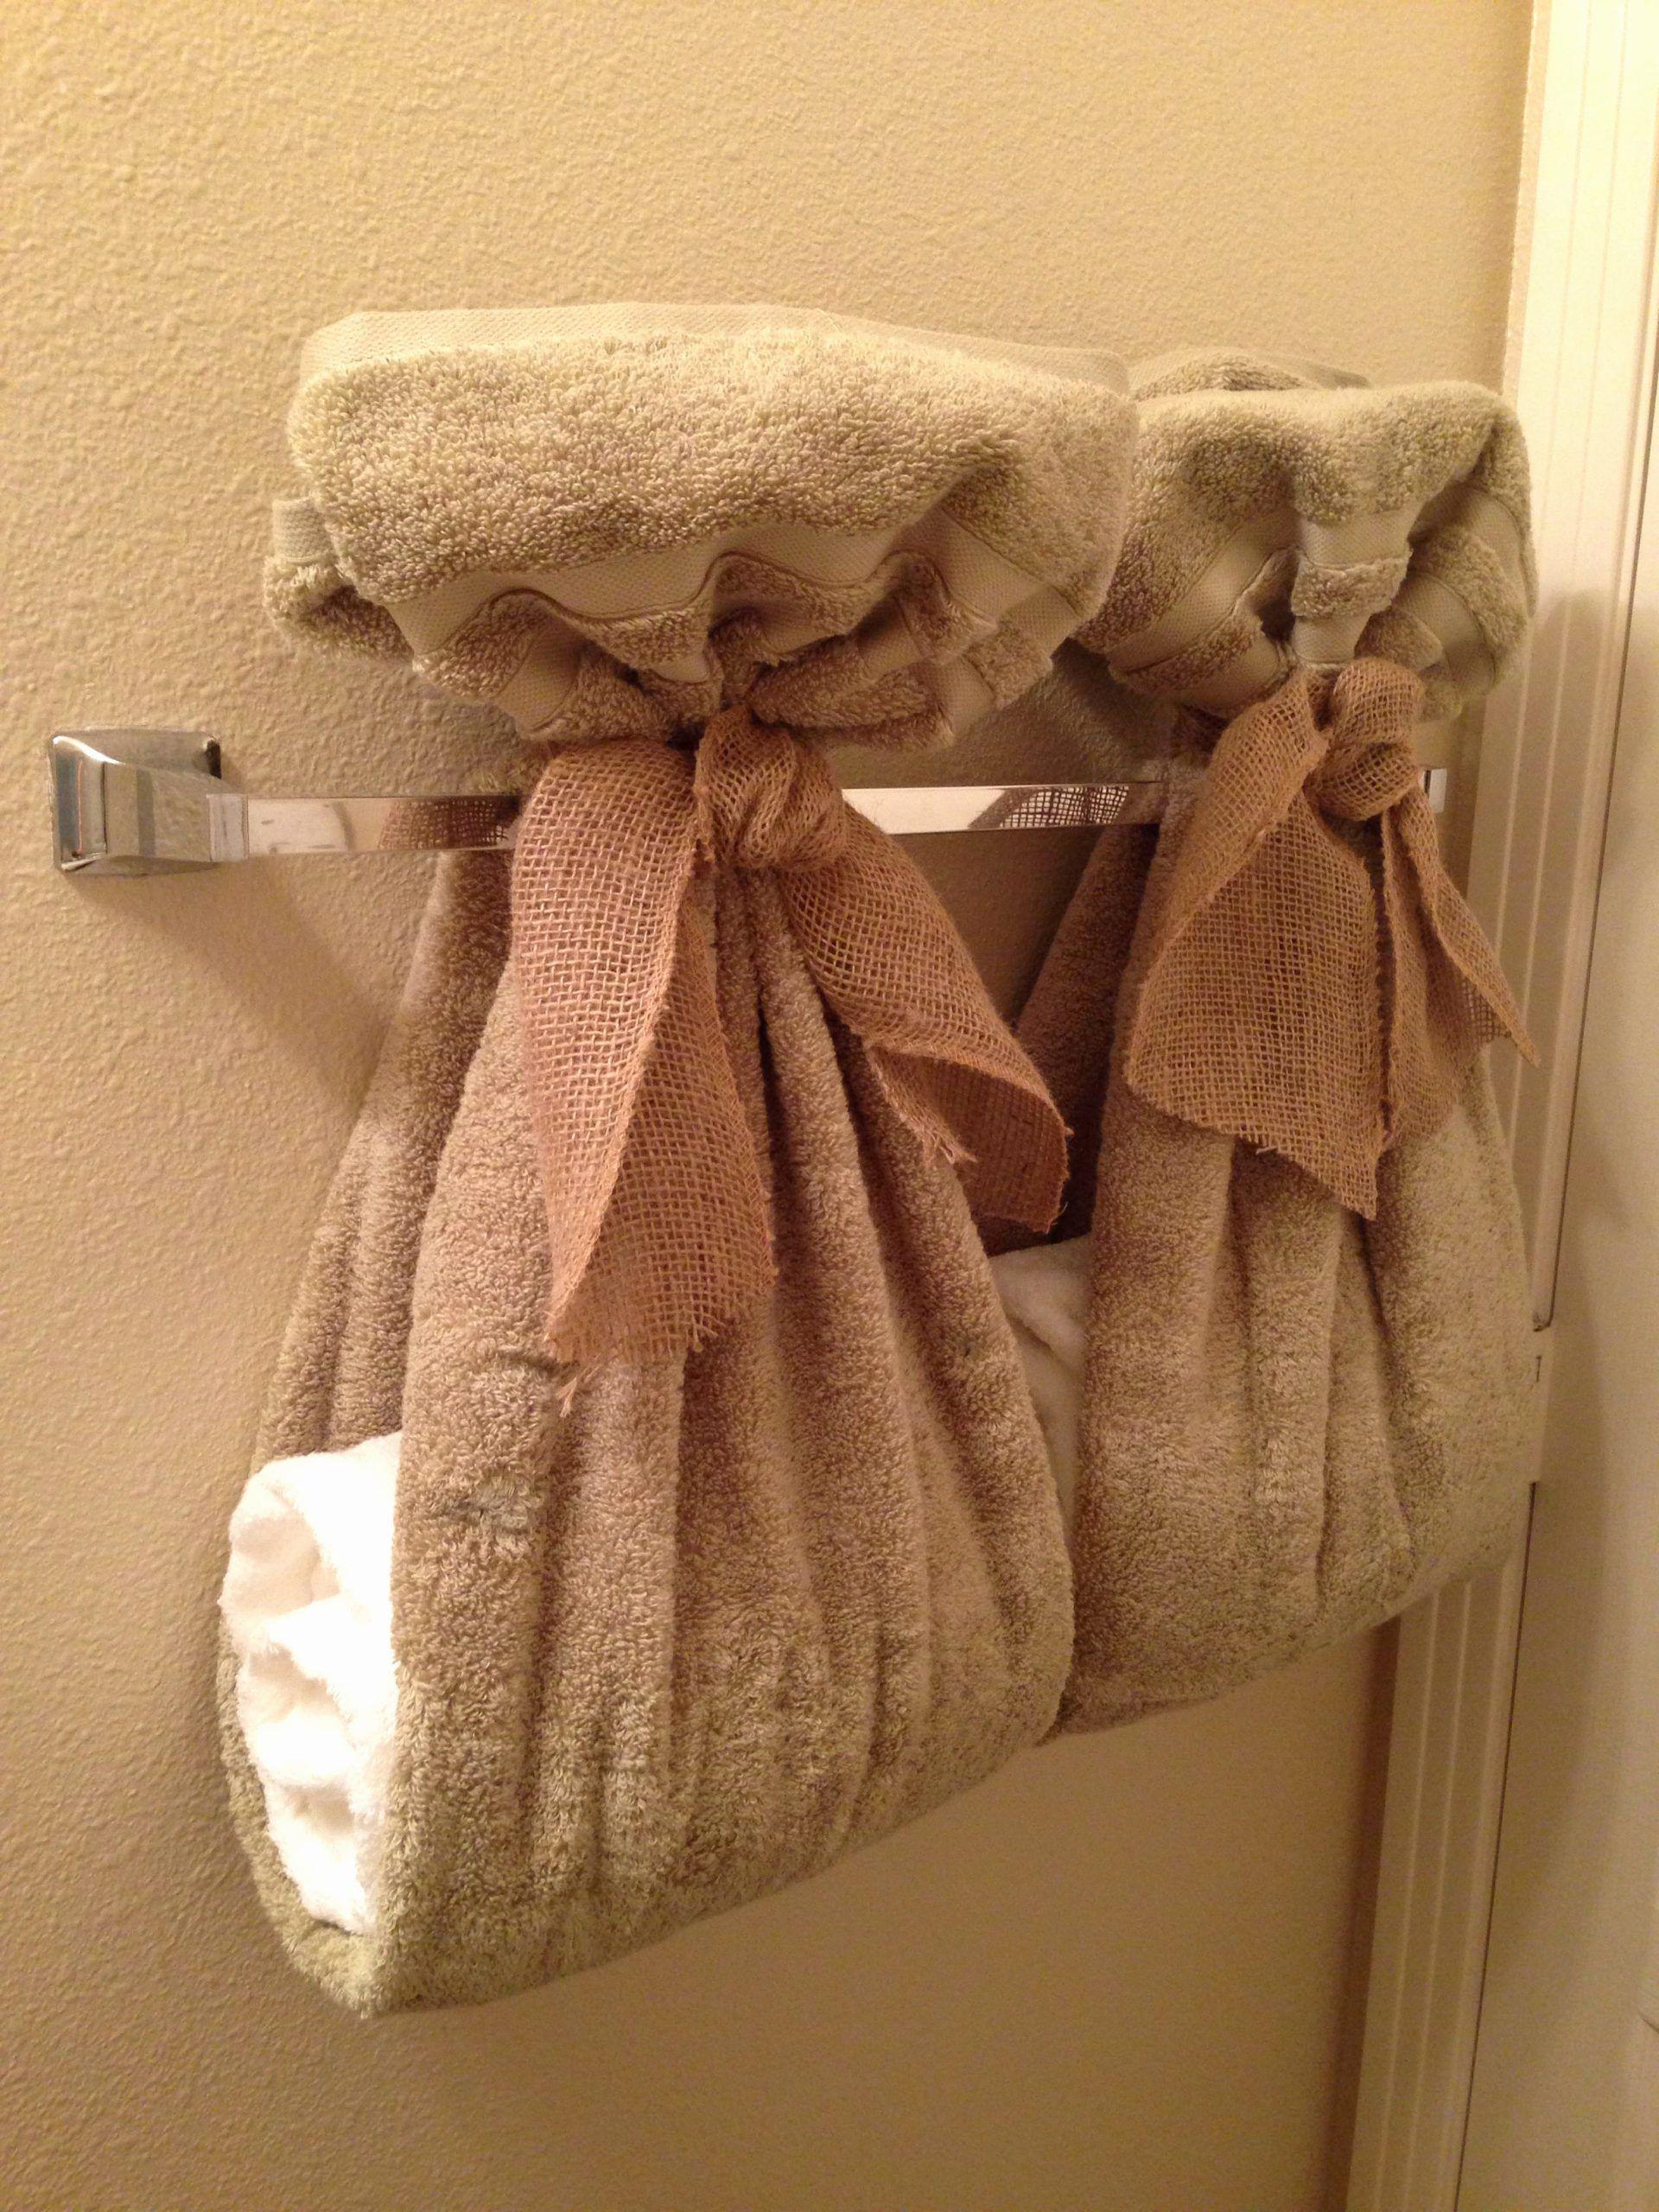 Organize Conquer Clutter Beautify Your Home The Half Bath Fix Bathroom Towel Decor Bathroom Towel Decor Ideas Decorative Towels